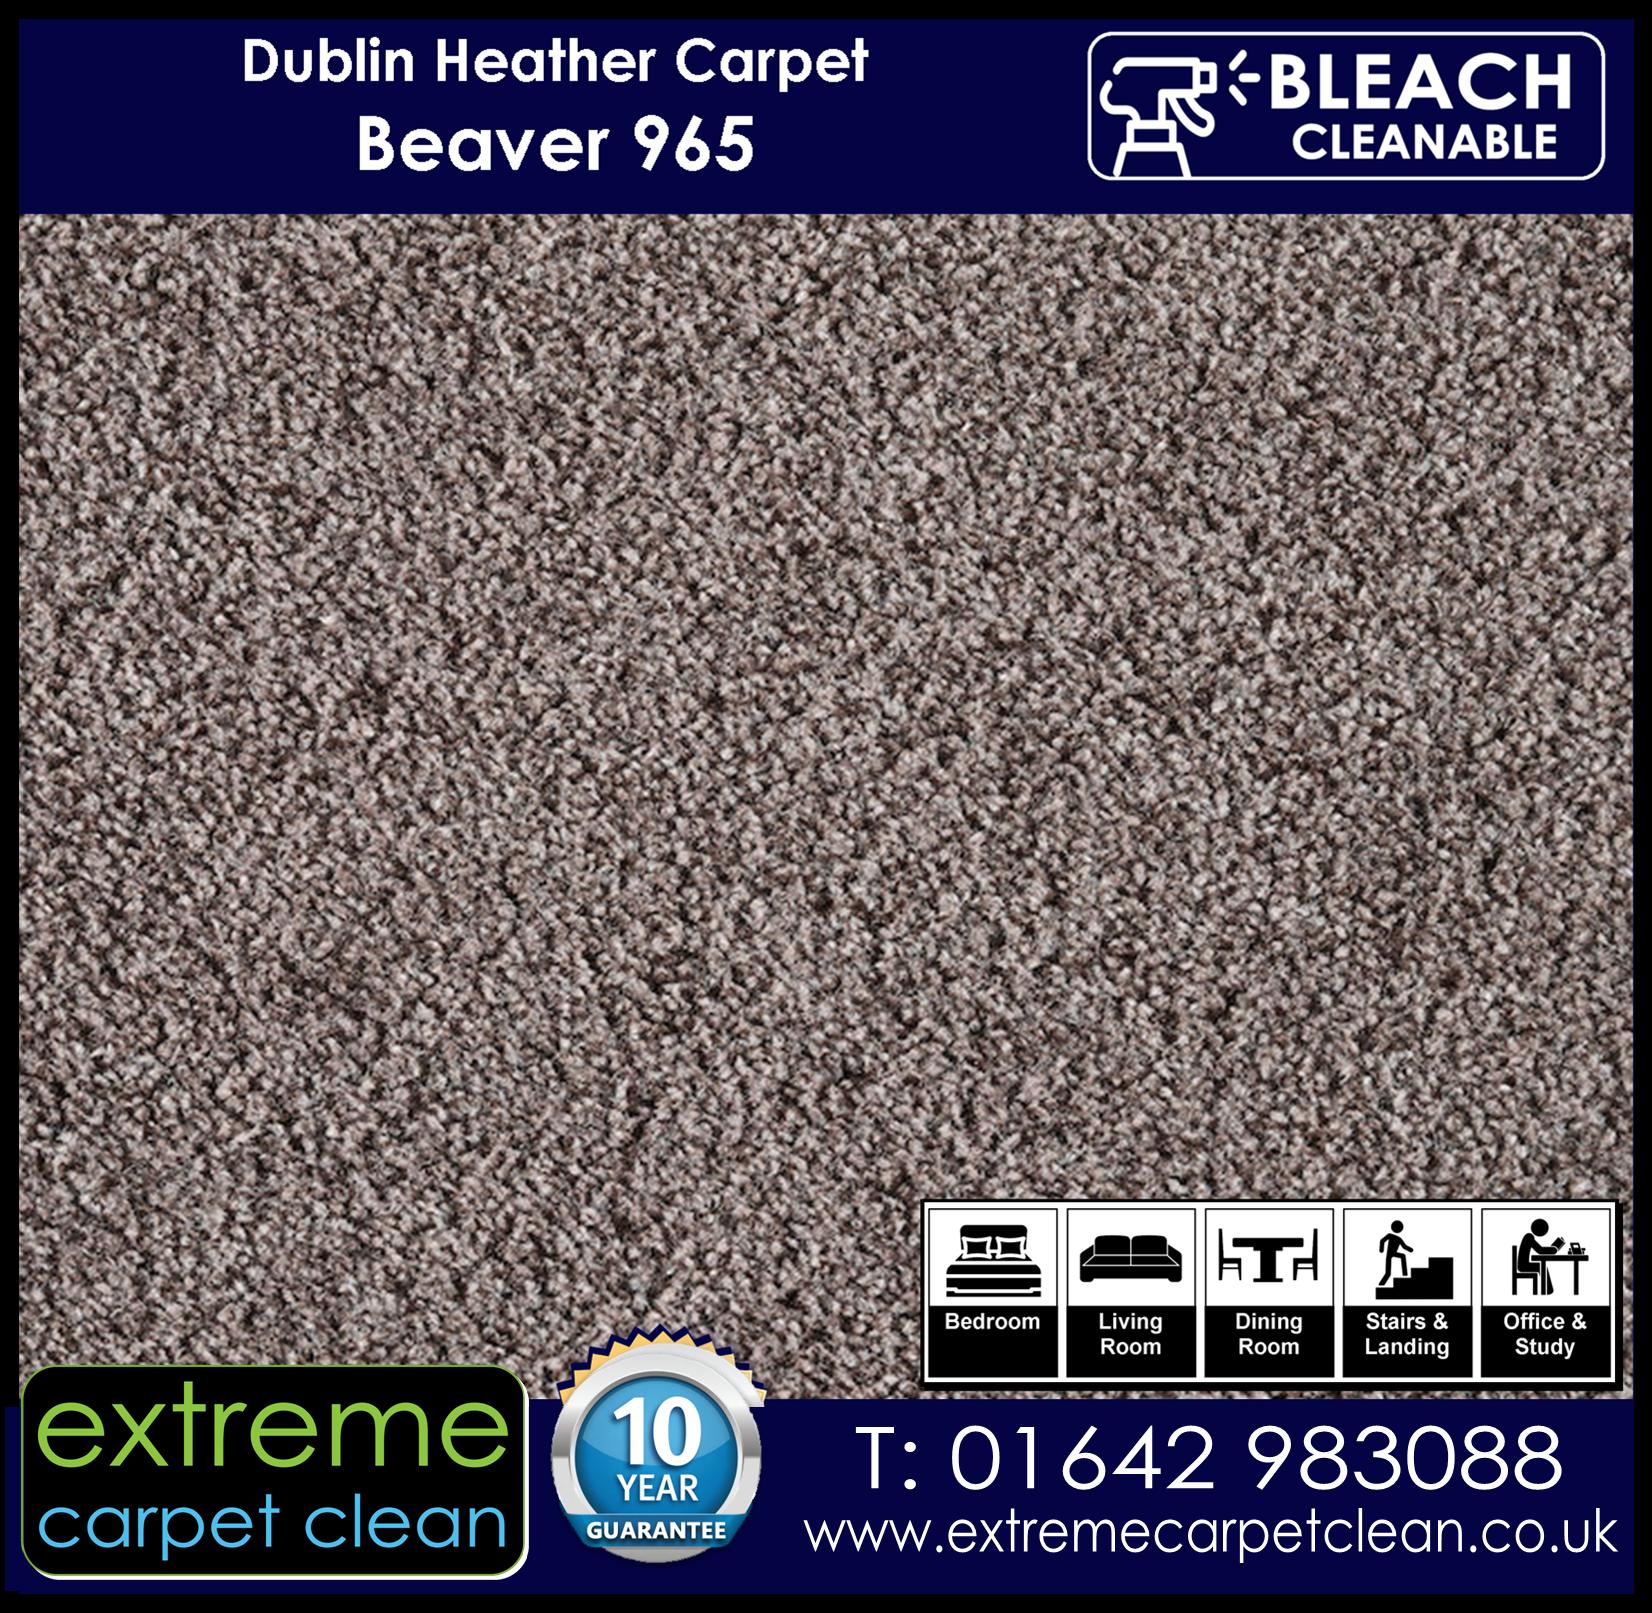 Dublin Heather Carpet Range. Beaver 965 Extreme Carpet Clean